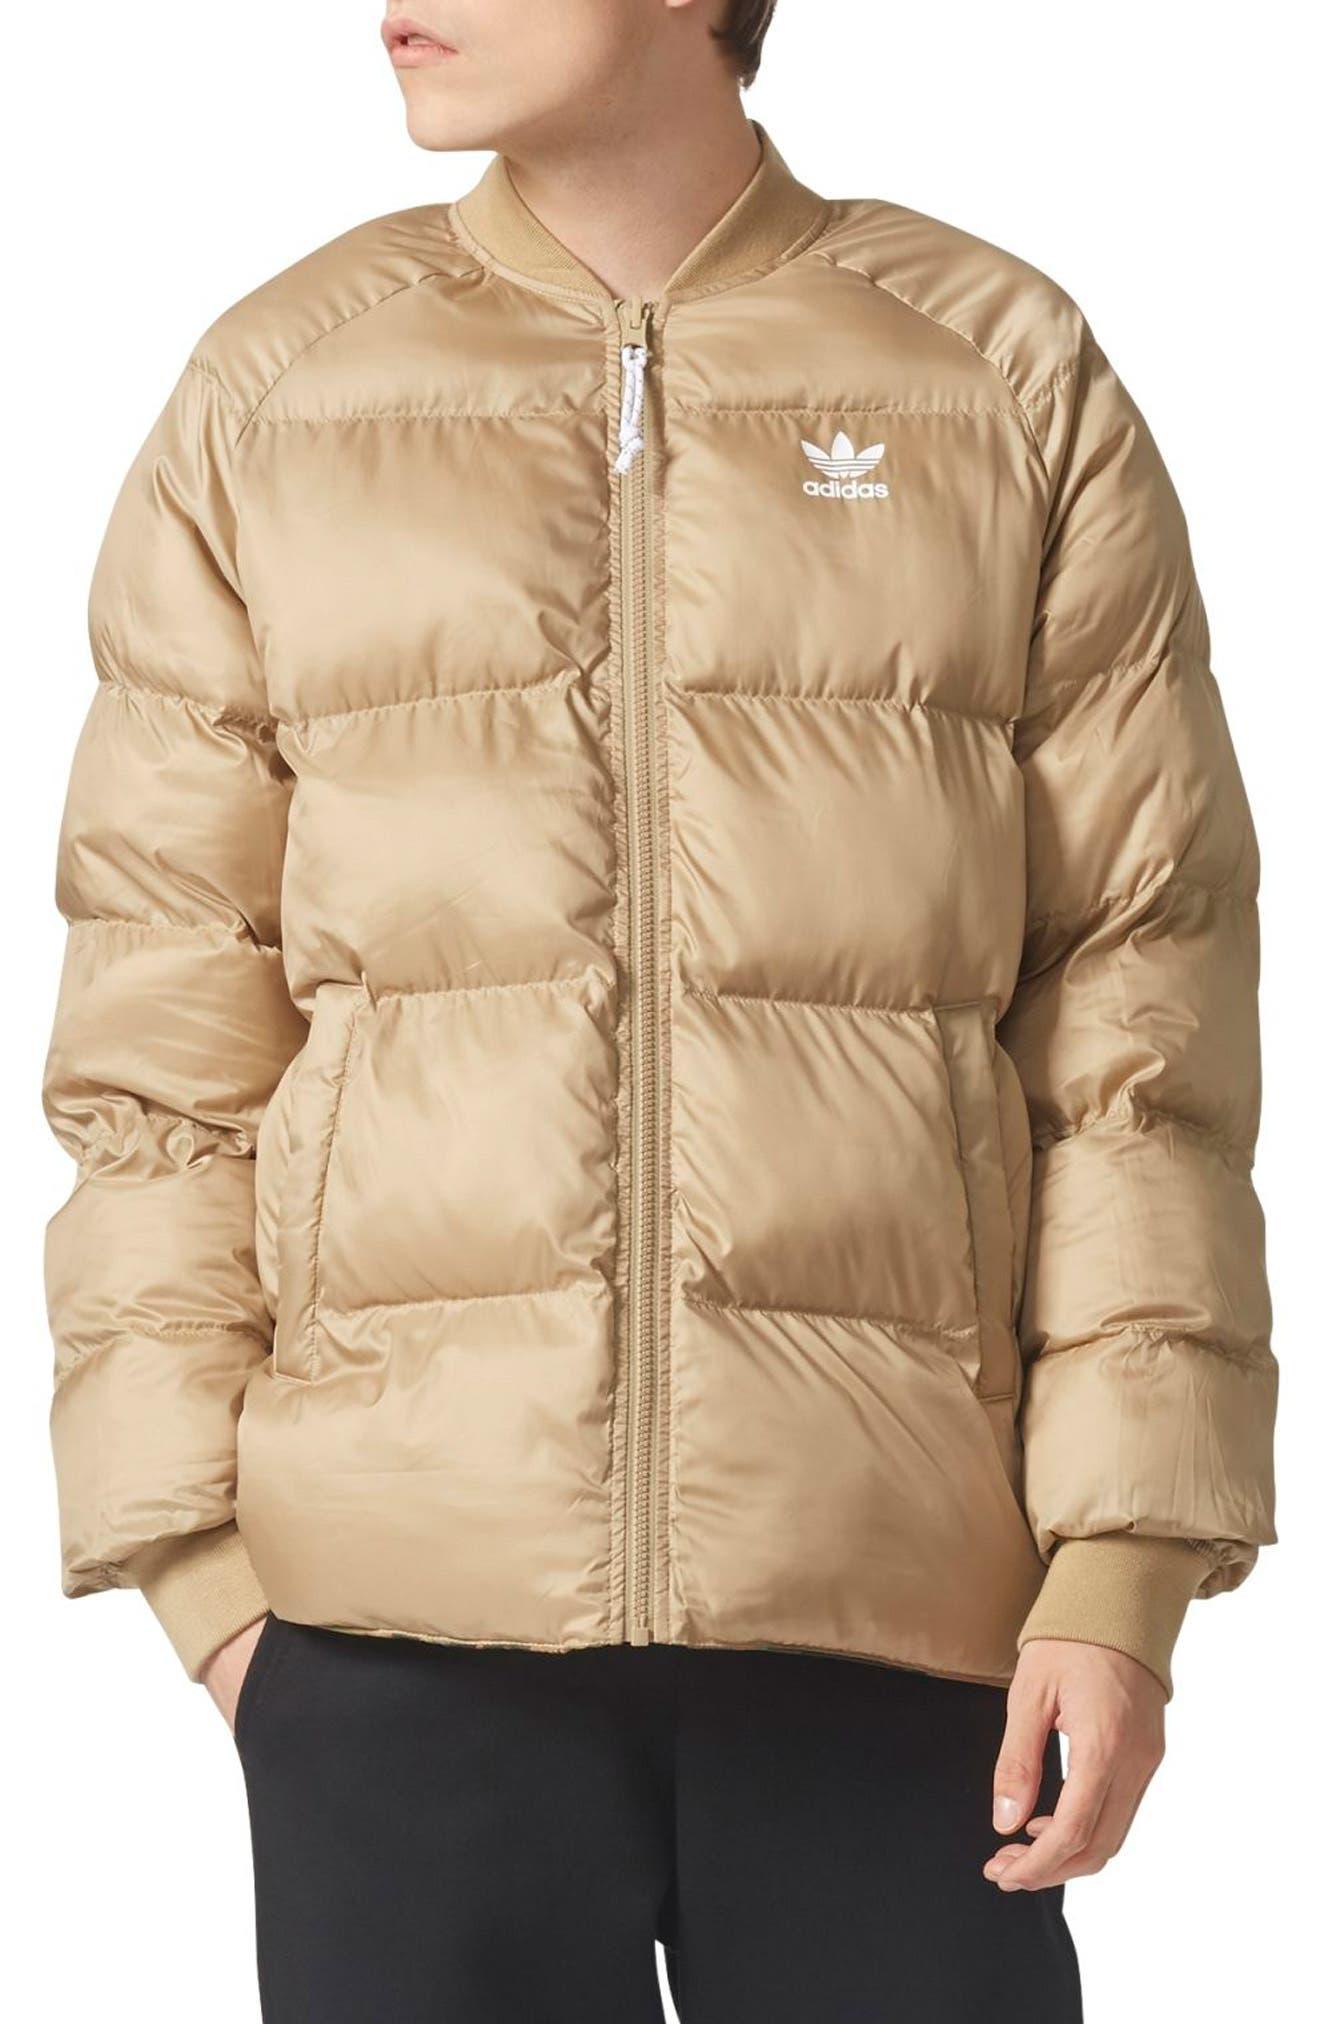 Originals SST Reversible Winter Jacket,                             Alternate thumbnail 4, color,